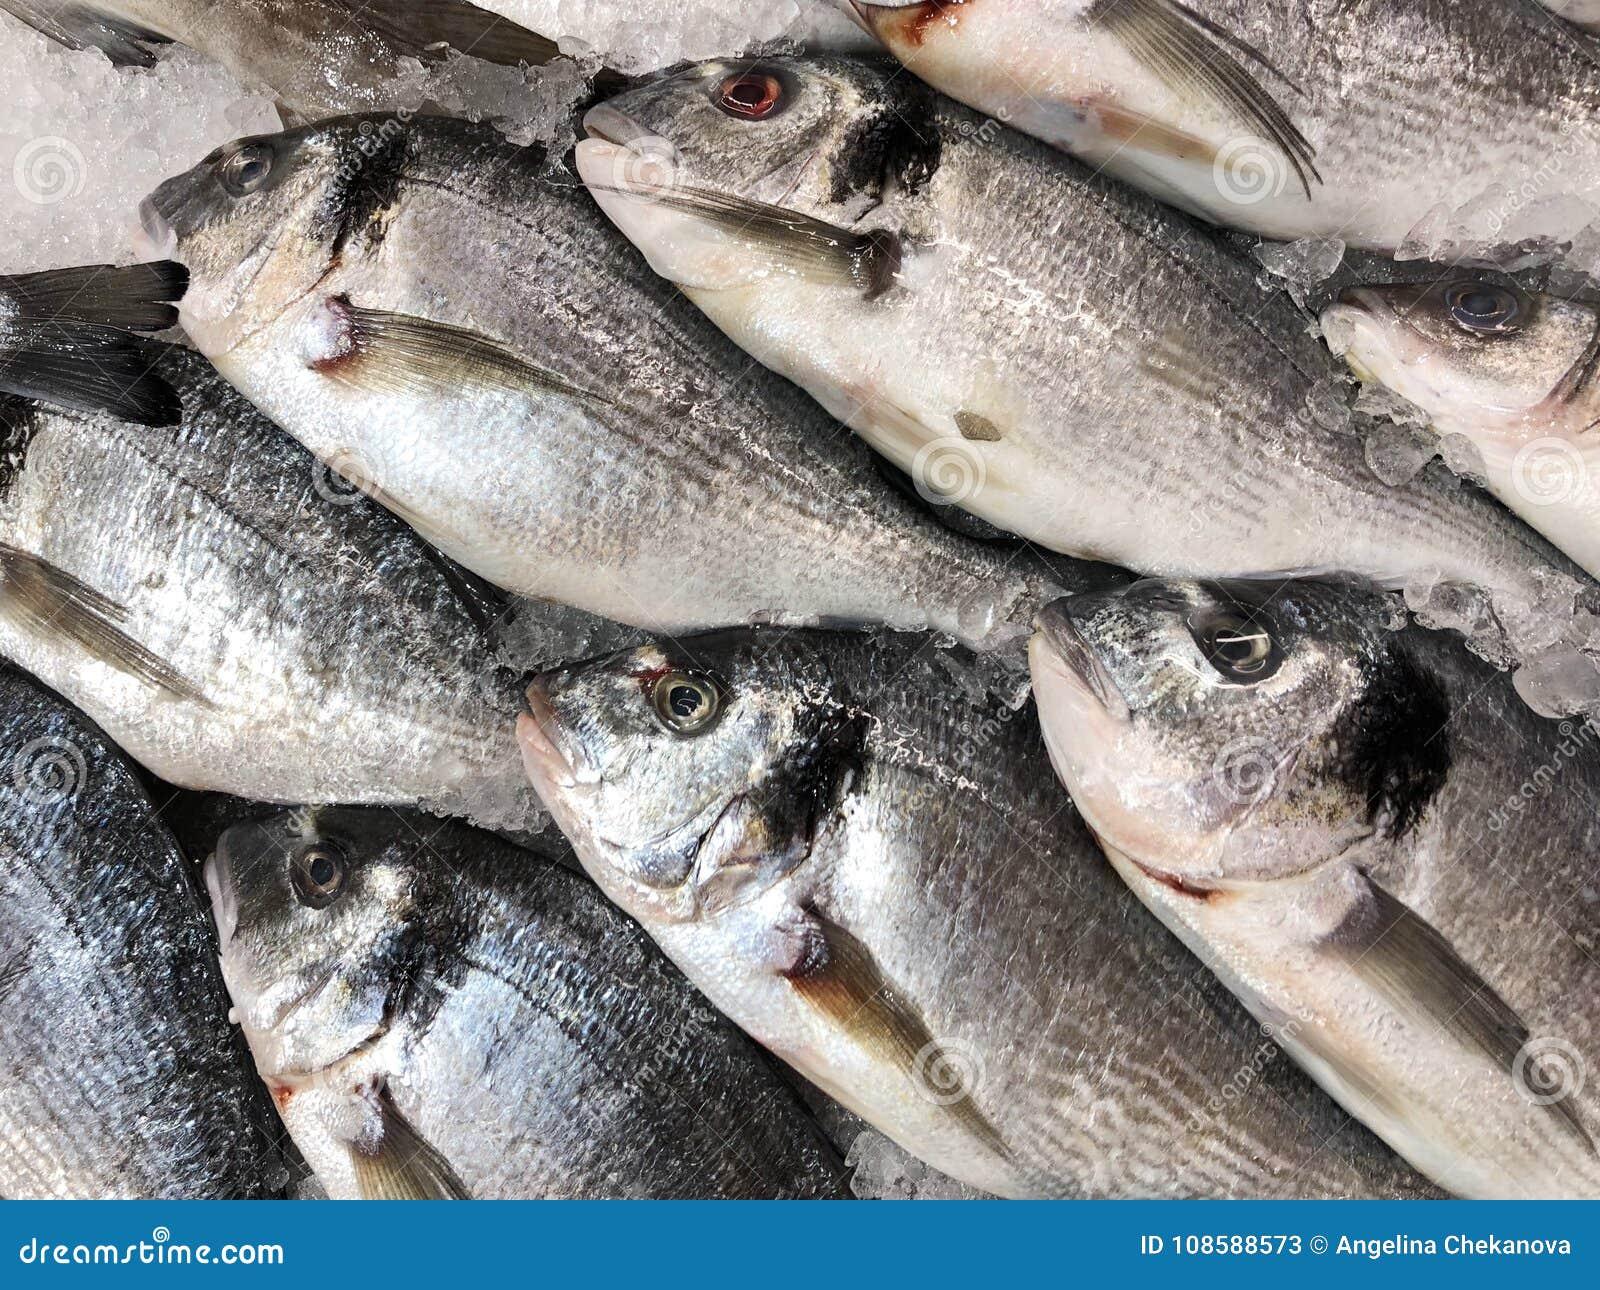 Fresh tasty fish on ice at market